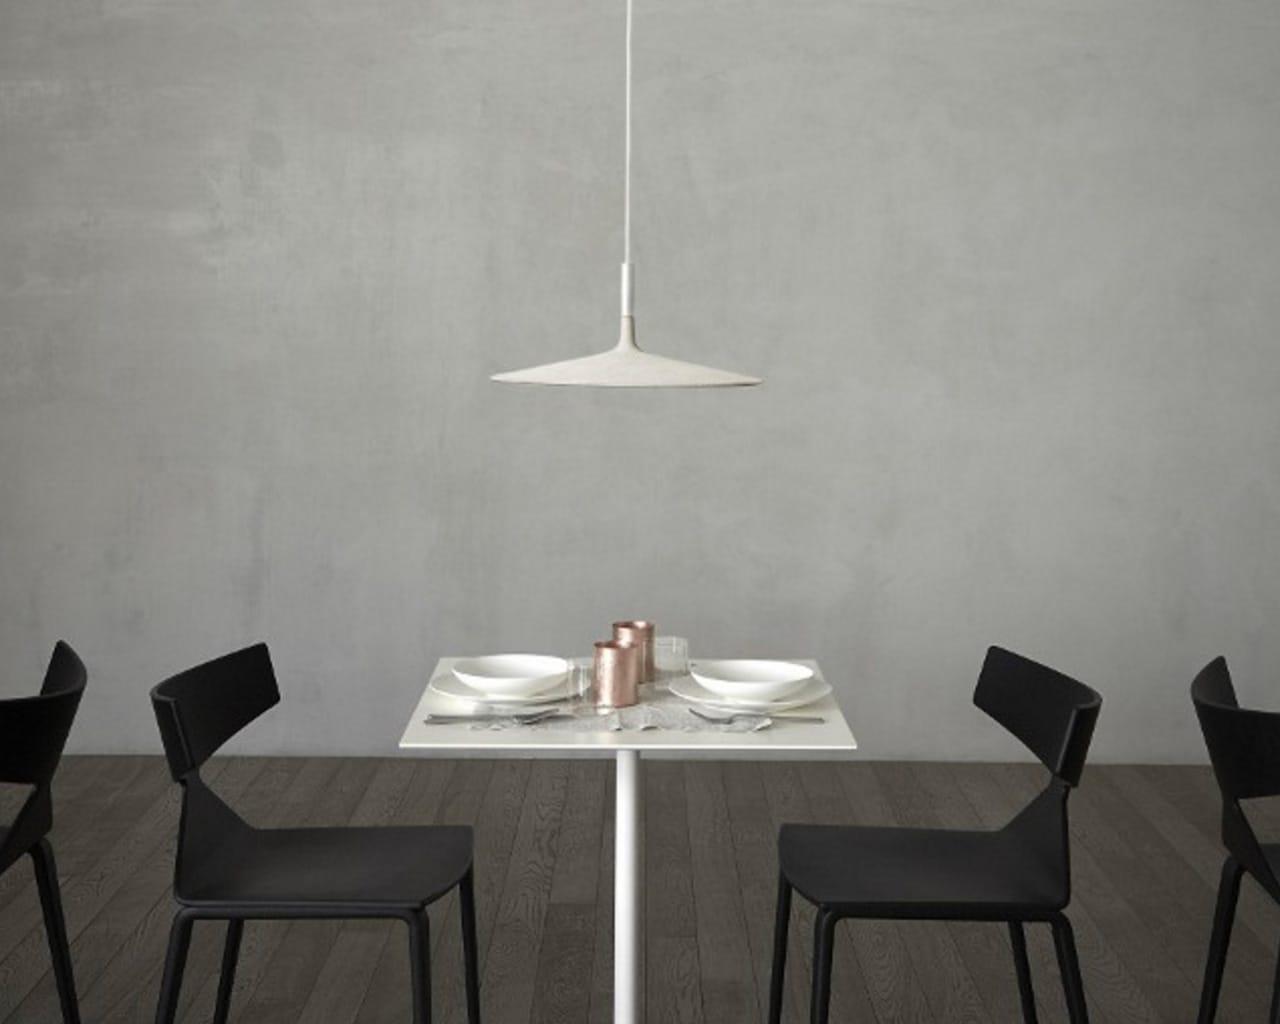 Lampade A Sospensione Foscarini : Aplomb large lampada da sospensione foscarini condizionatori italia